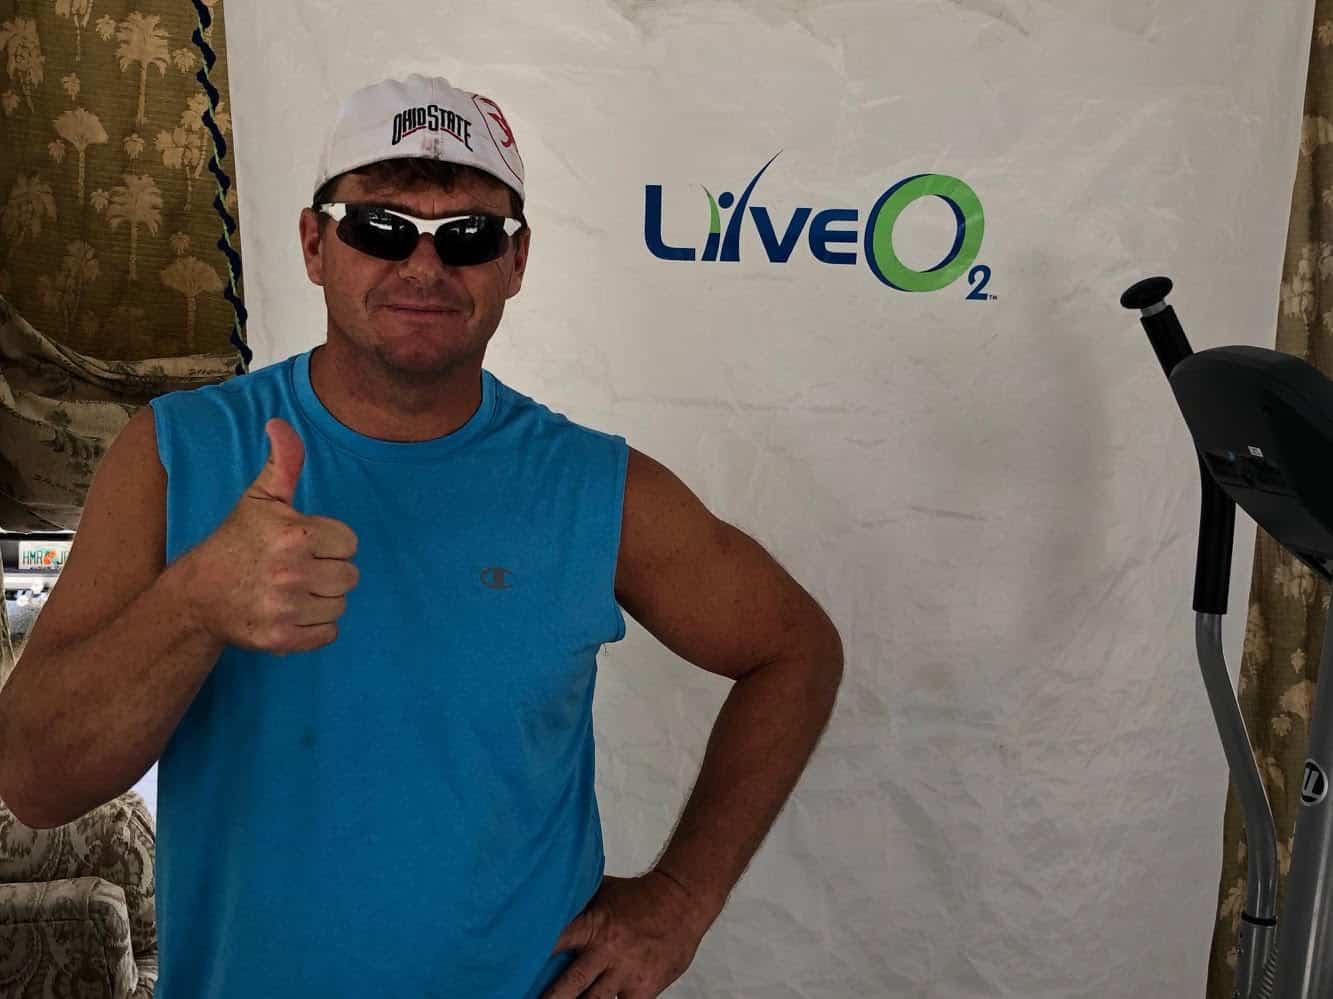 Jeff thumbs up LiveO2